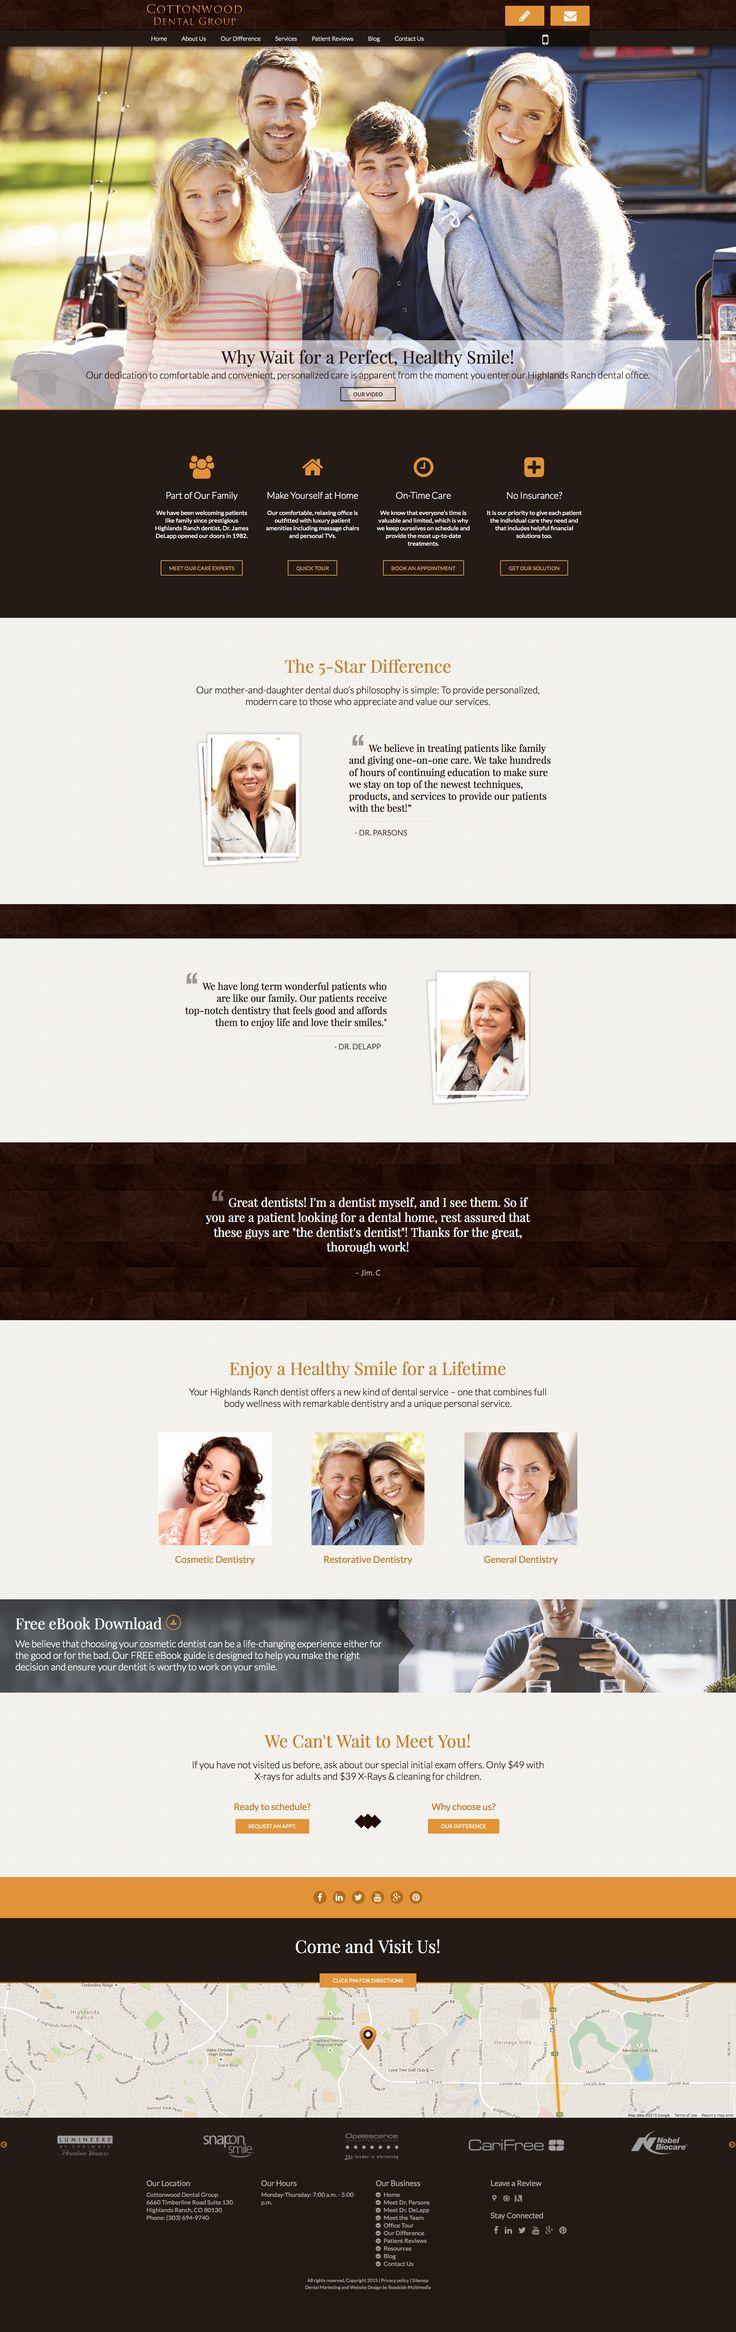 Cottonwood Dental Group: Class & Elegance | Dental Websites